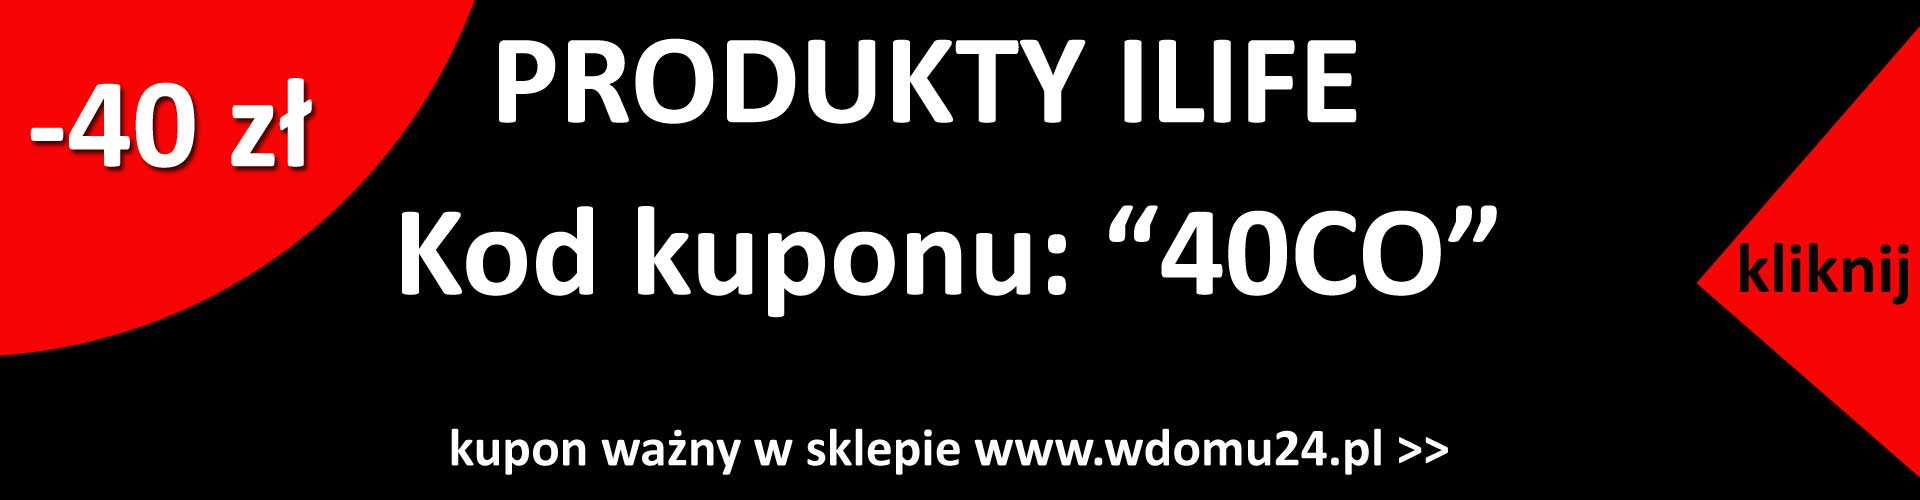 Ilife kod rabatowy kupon do sklepu wdomu24.pl